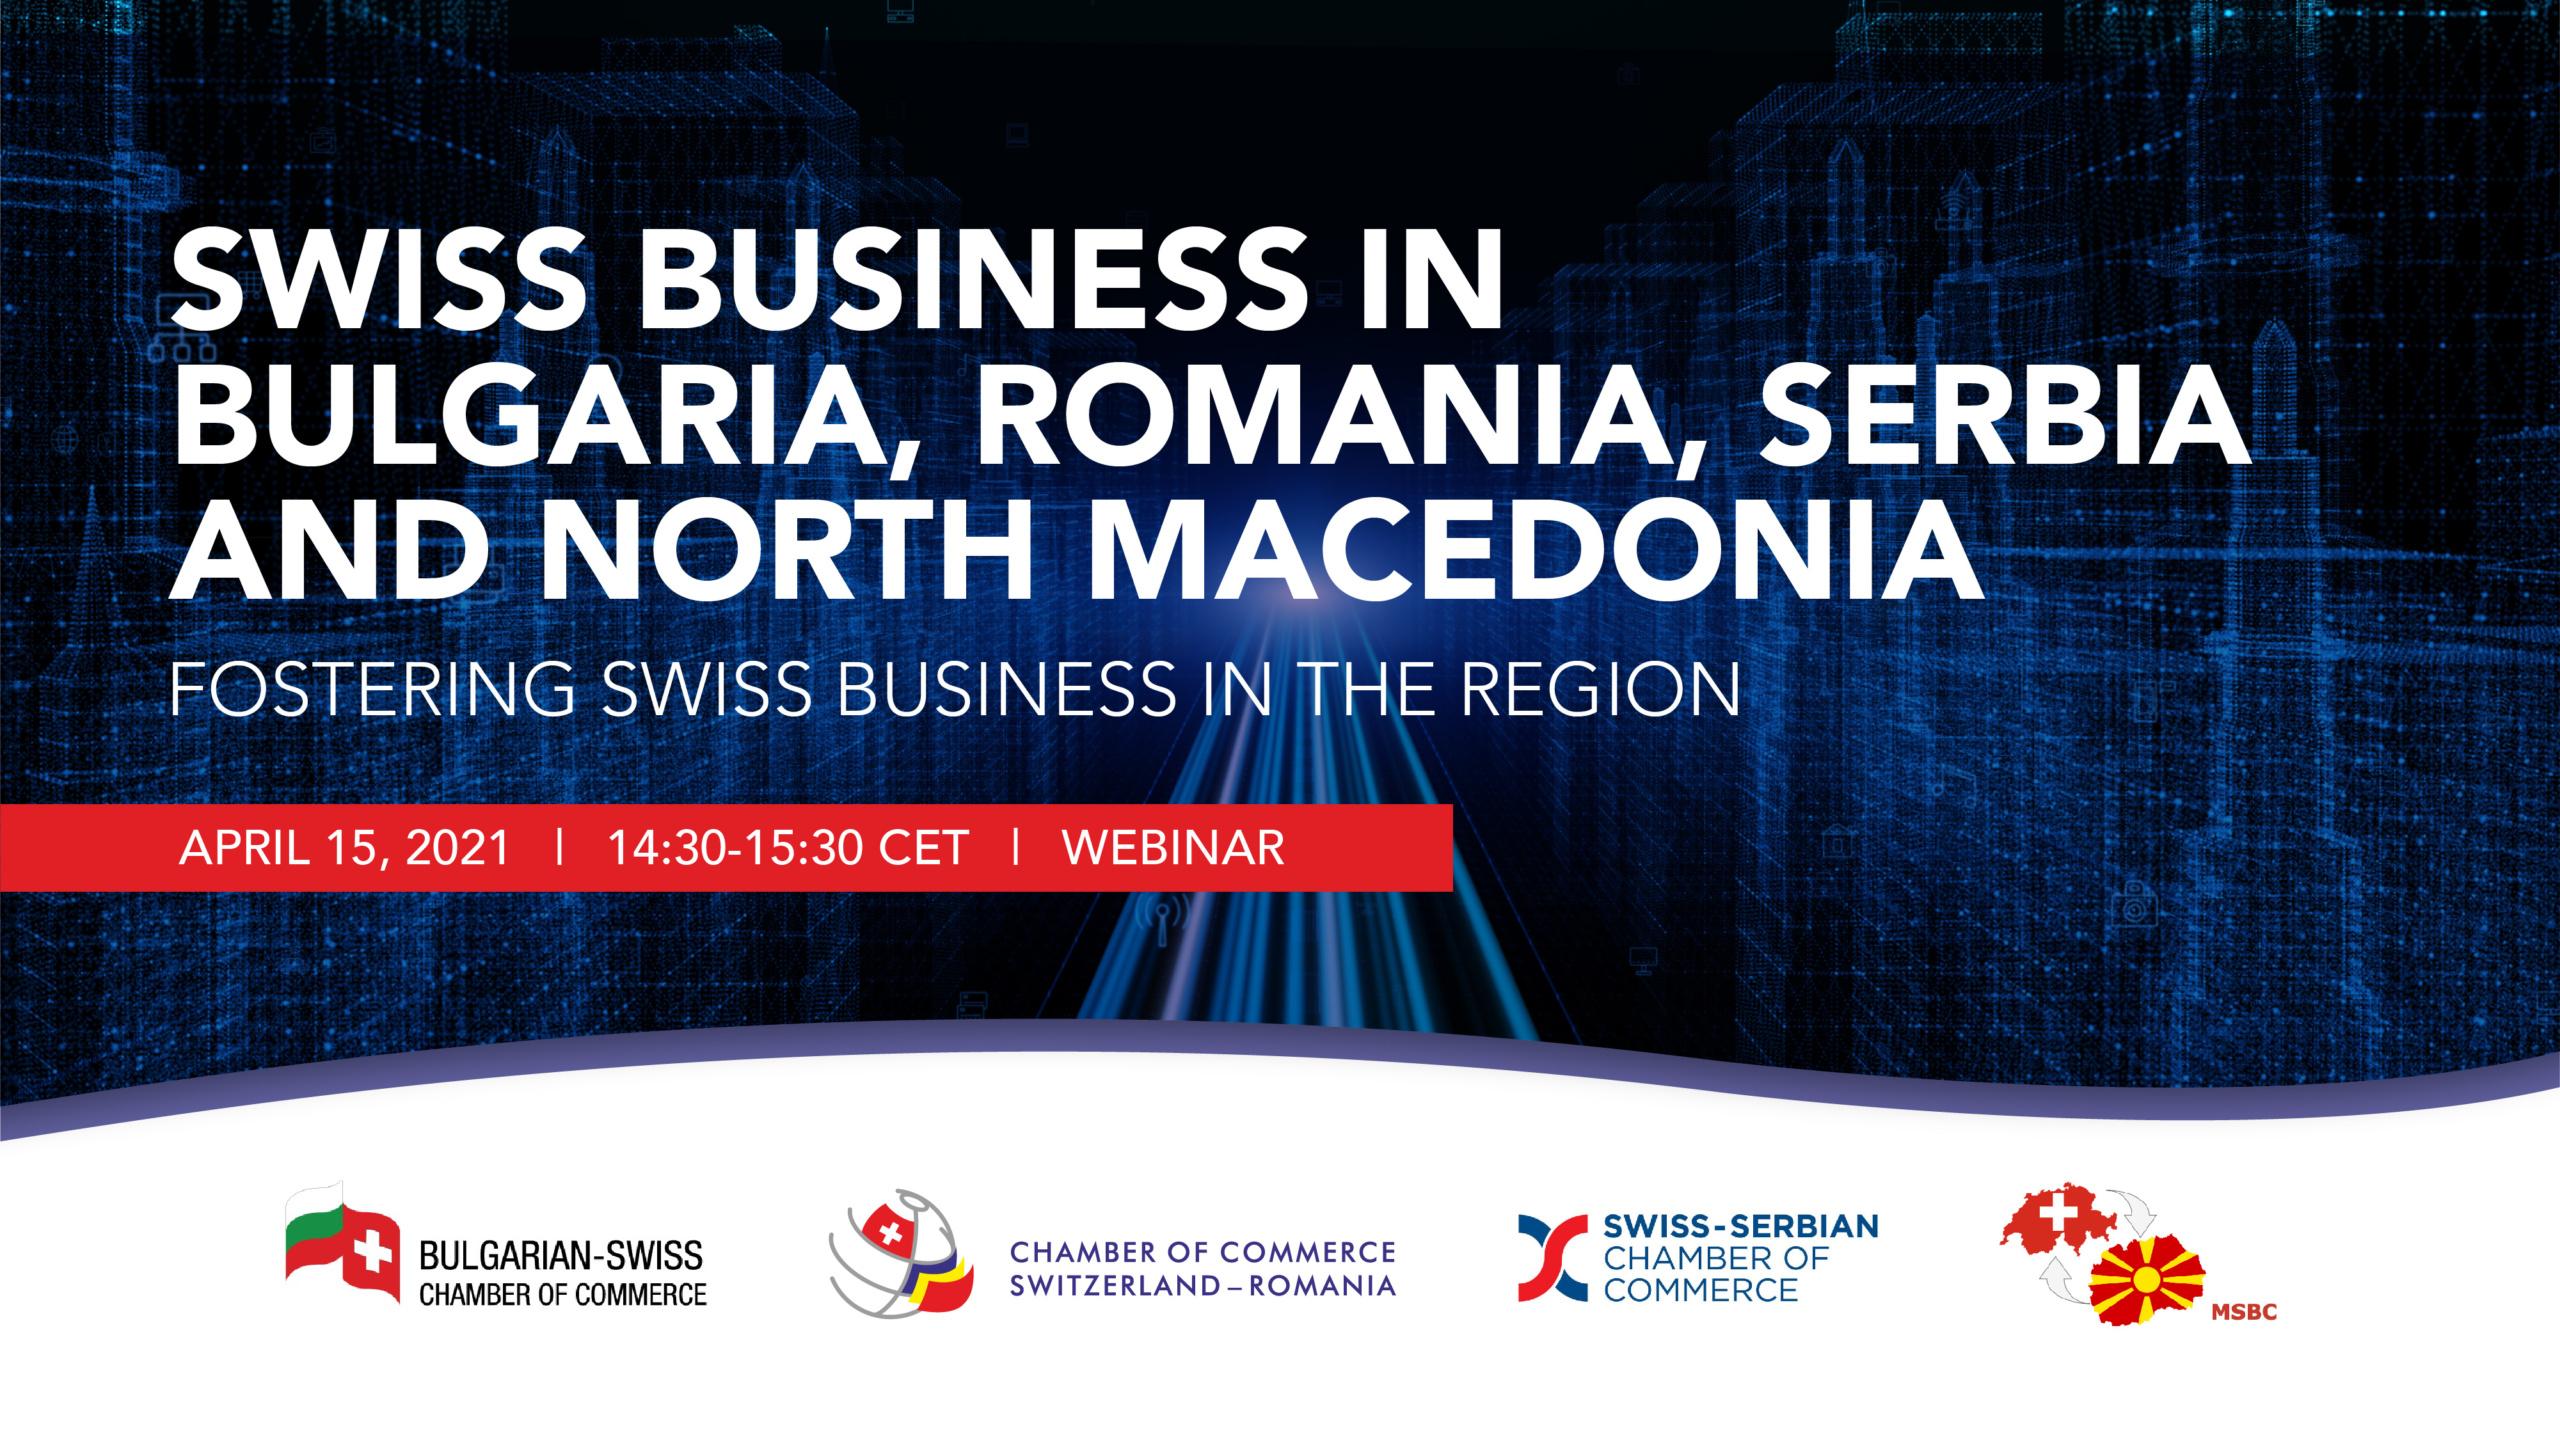 Swiss Business in Bulgaria, Romania, Serbia and North Macedonia